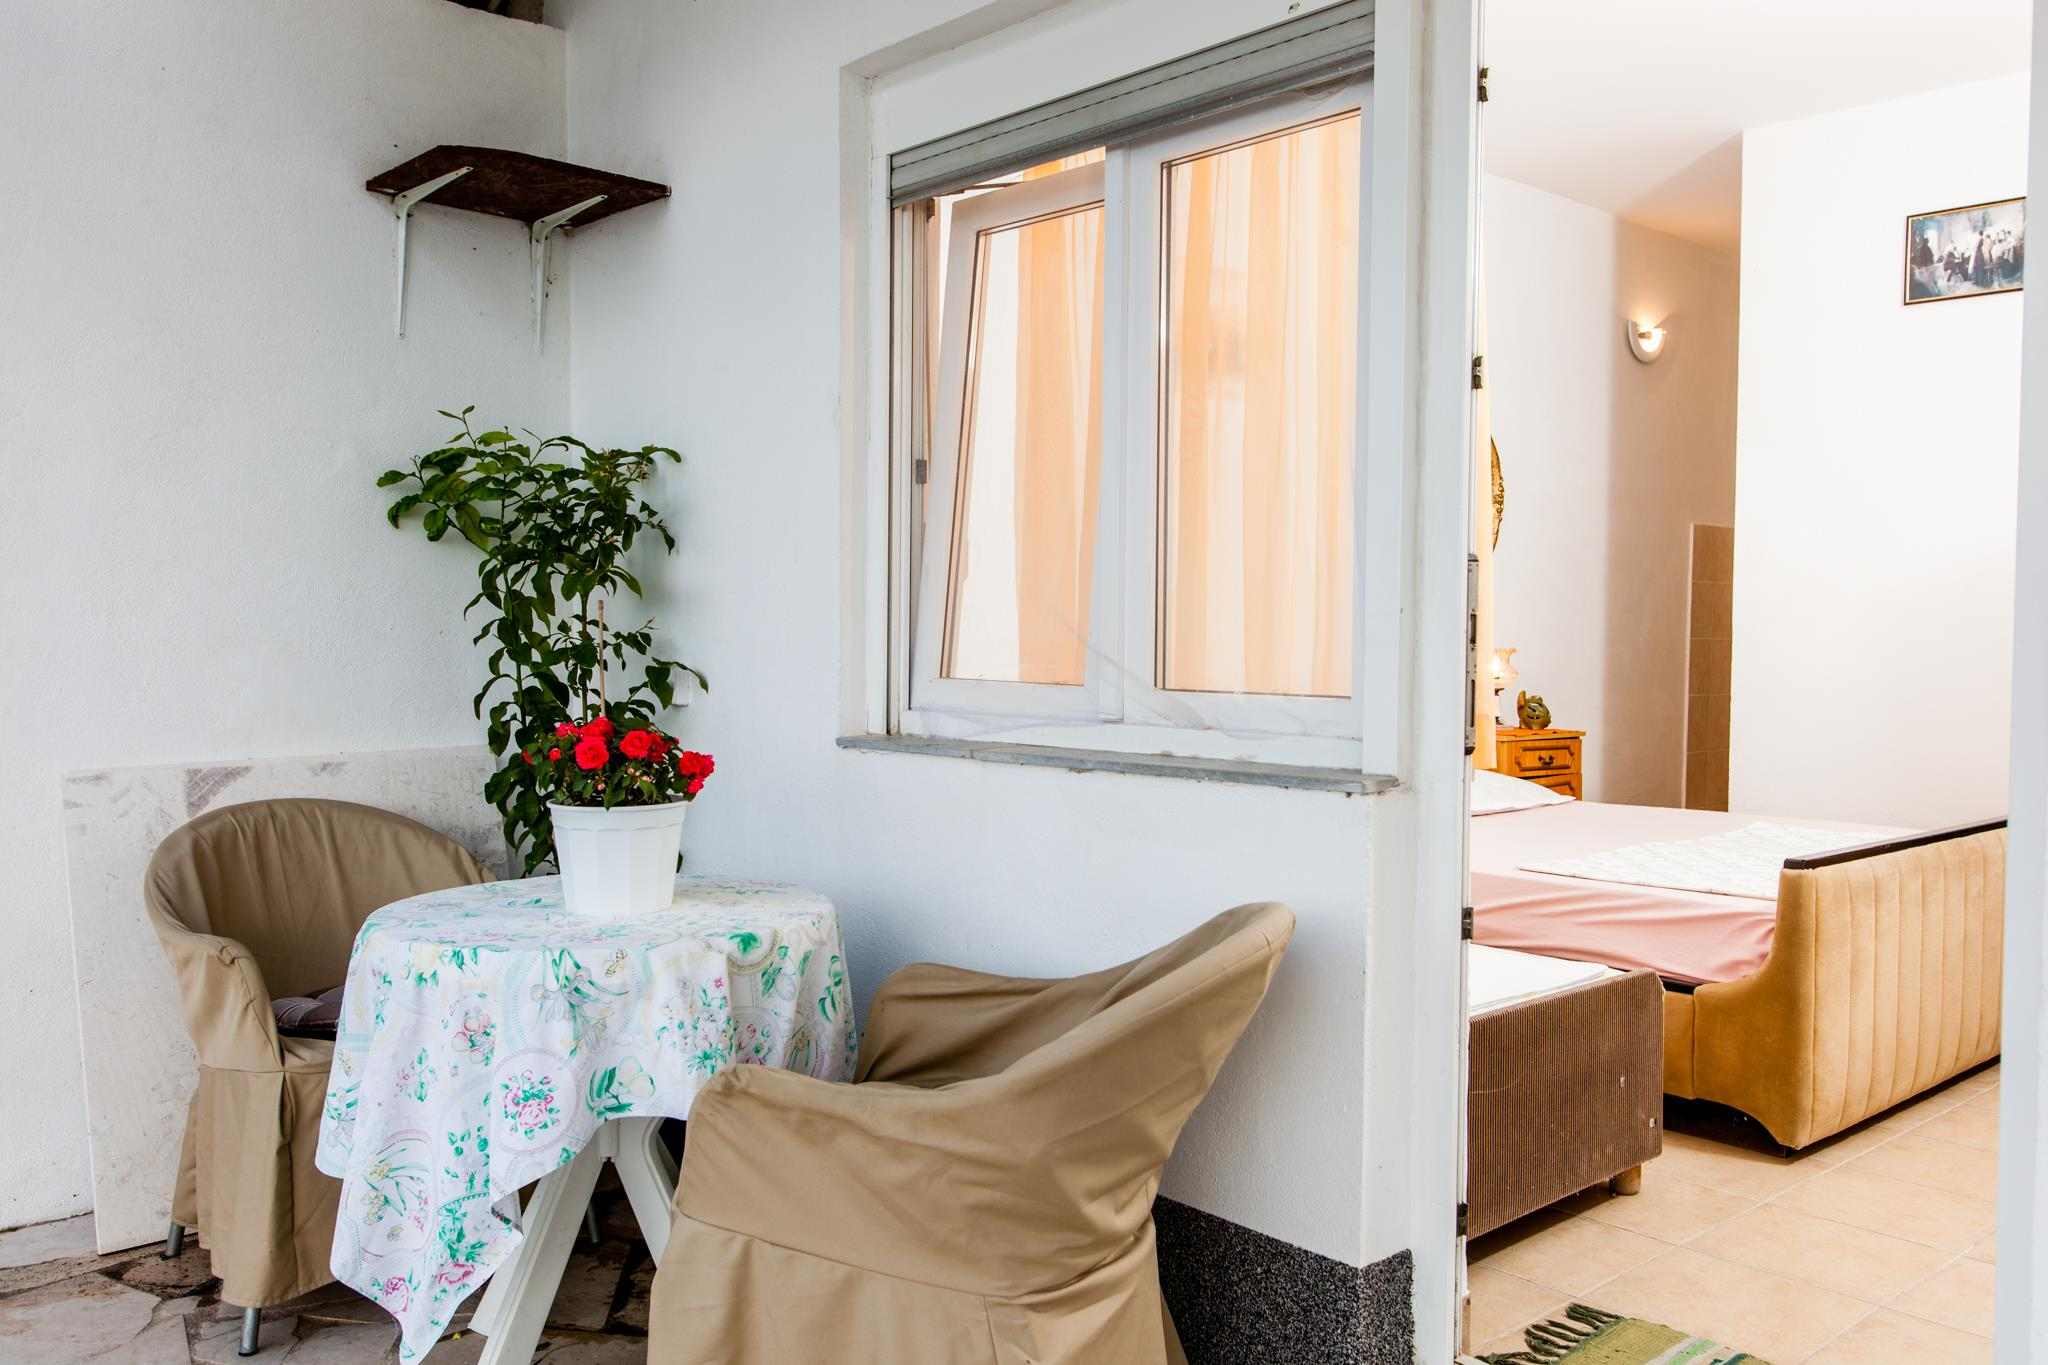 Ferienwohnung Apartments Bla~enka / A3 / One Bedroom (1928327), Lokva Rogoznica, , Dalmatien, Kroatien, Bild 6